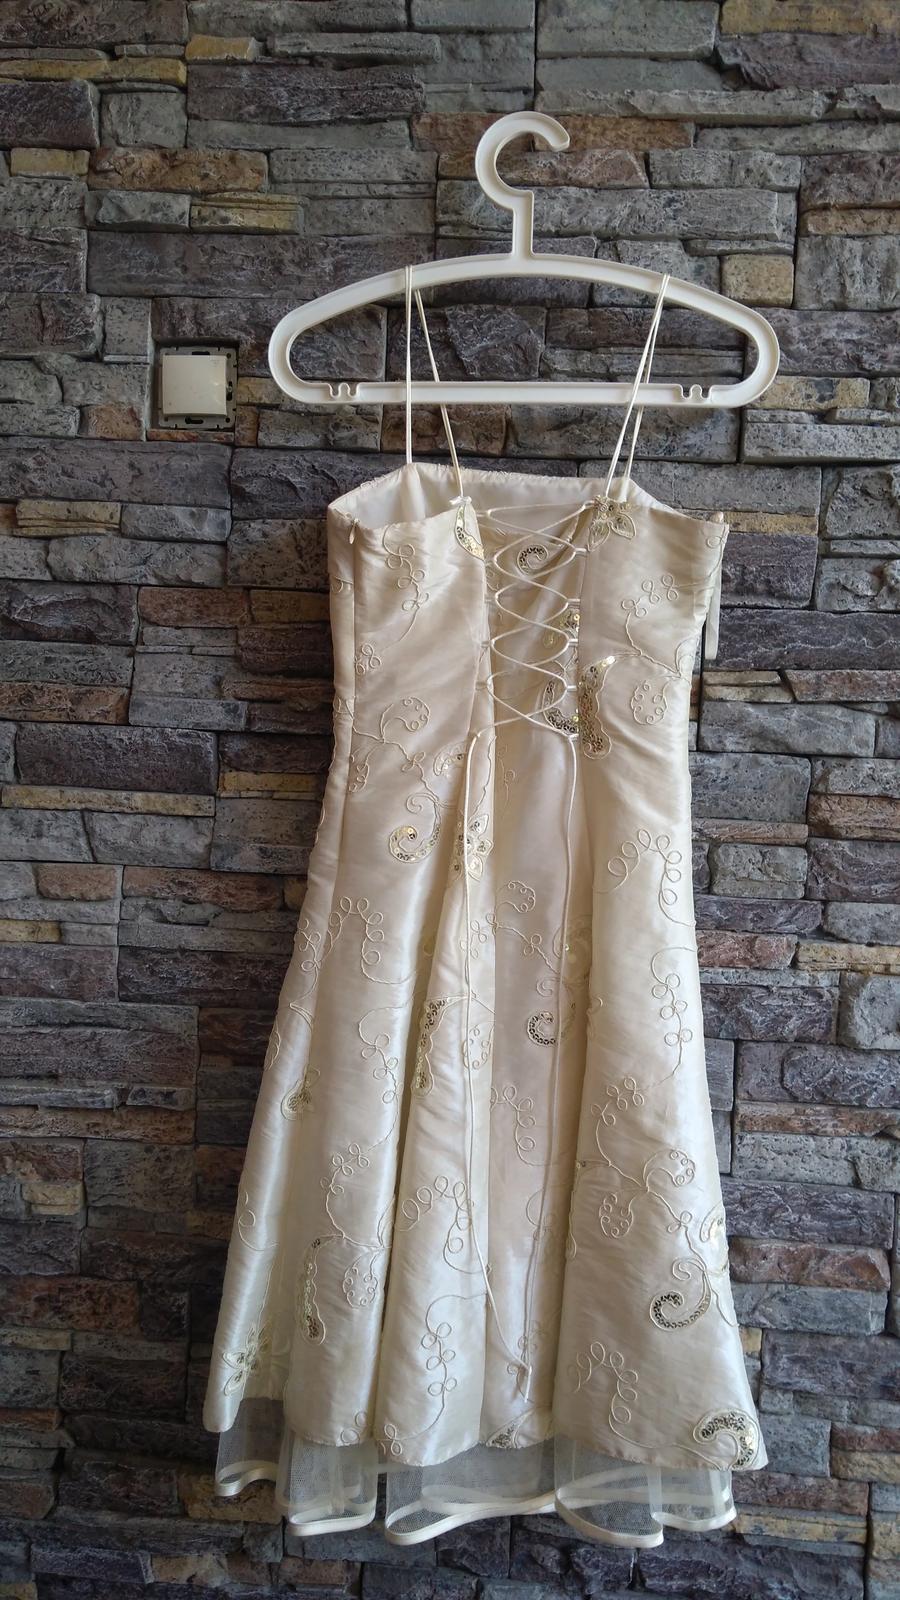 Zlaté šaty s flitrami po kolená - Obrázok č. 3